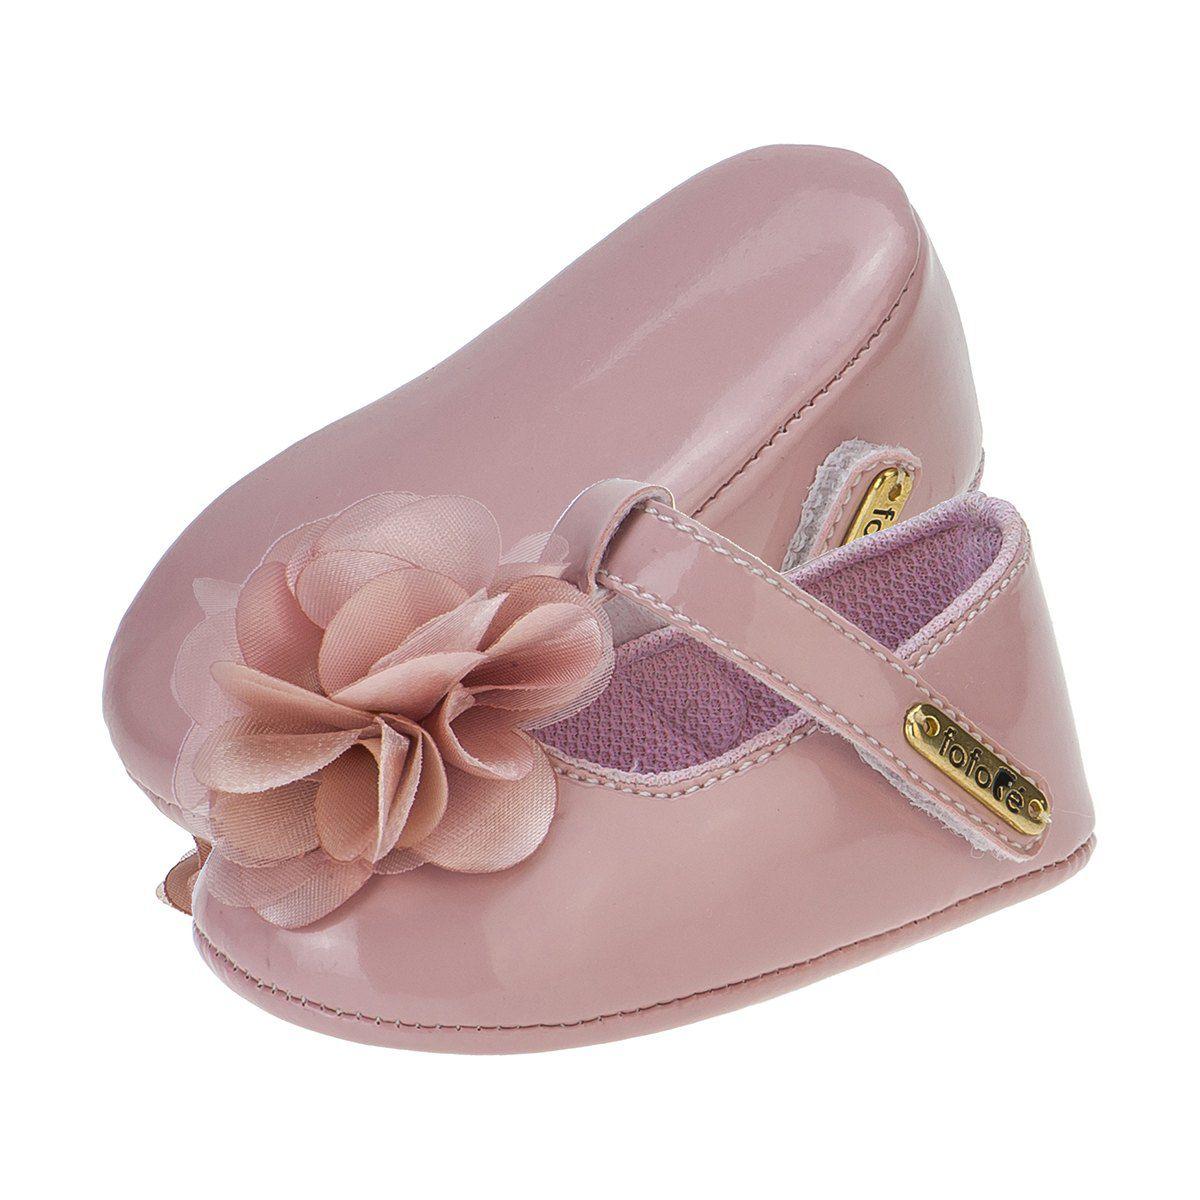 Sapato Boneca Menina Flor Rosê - FOFOPÉ